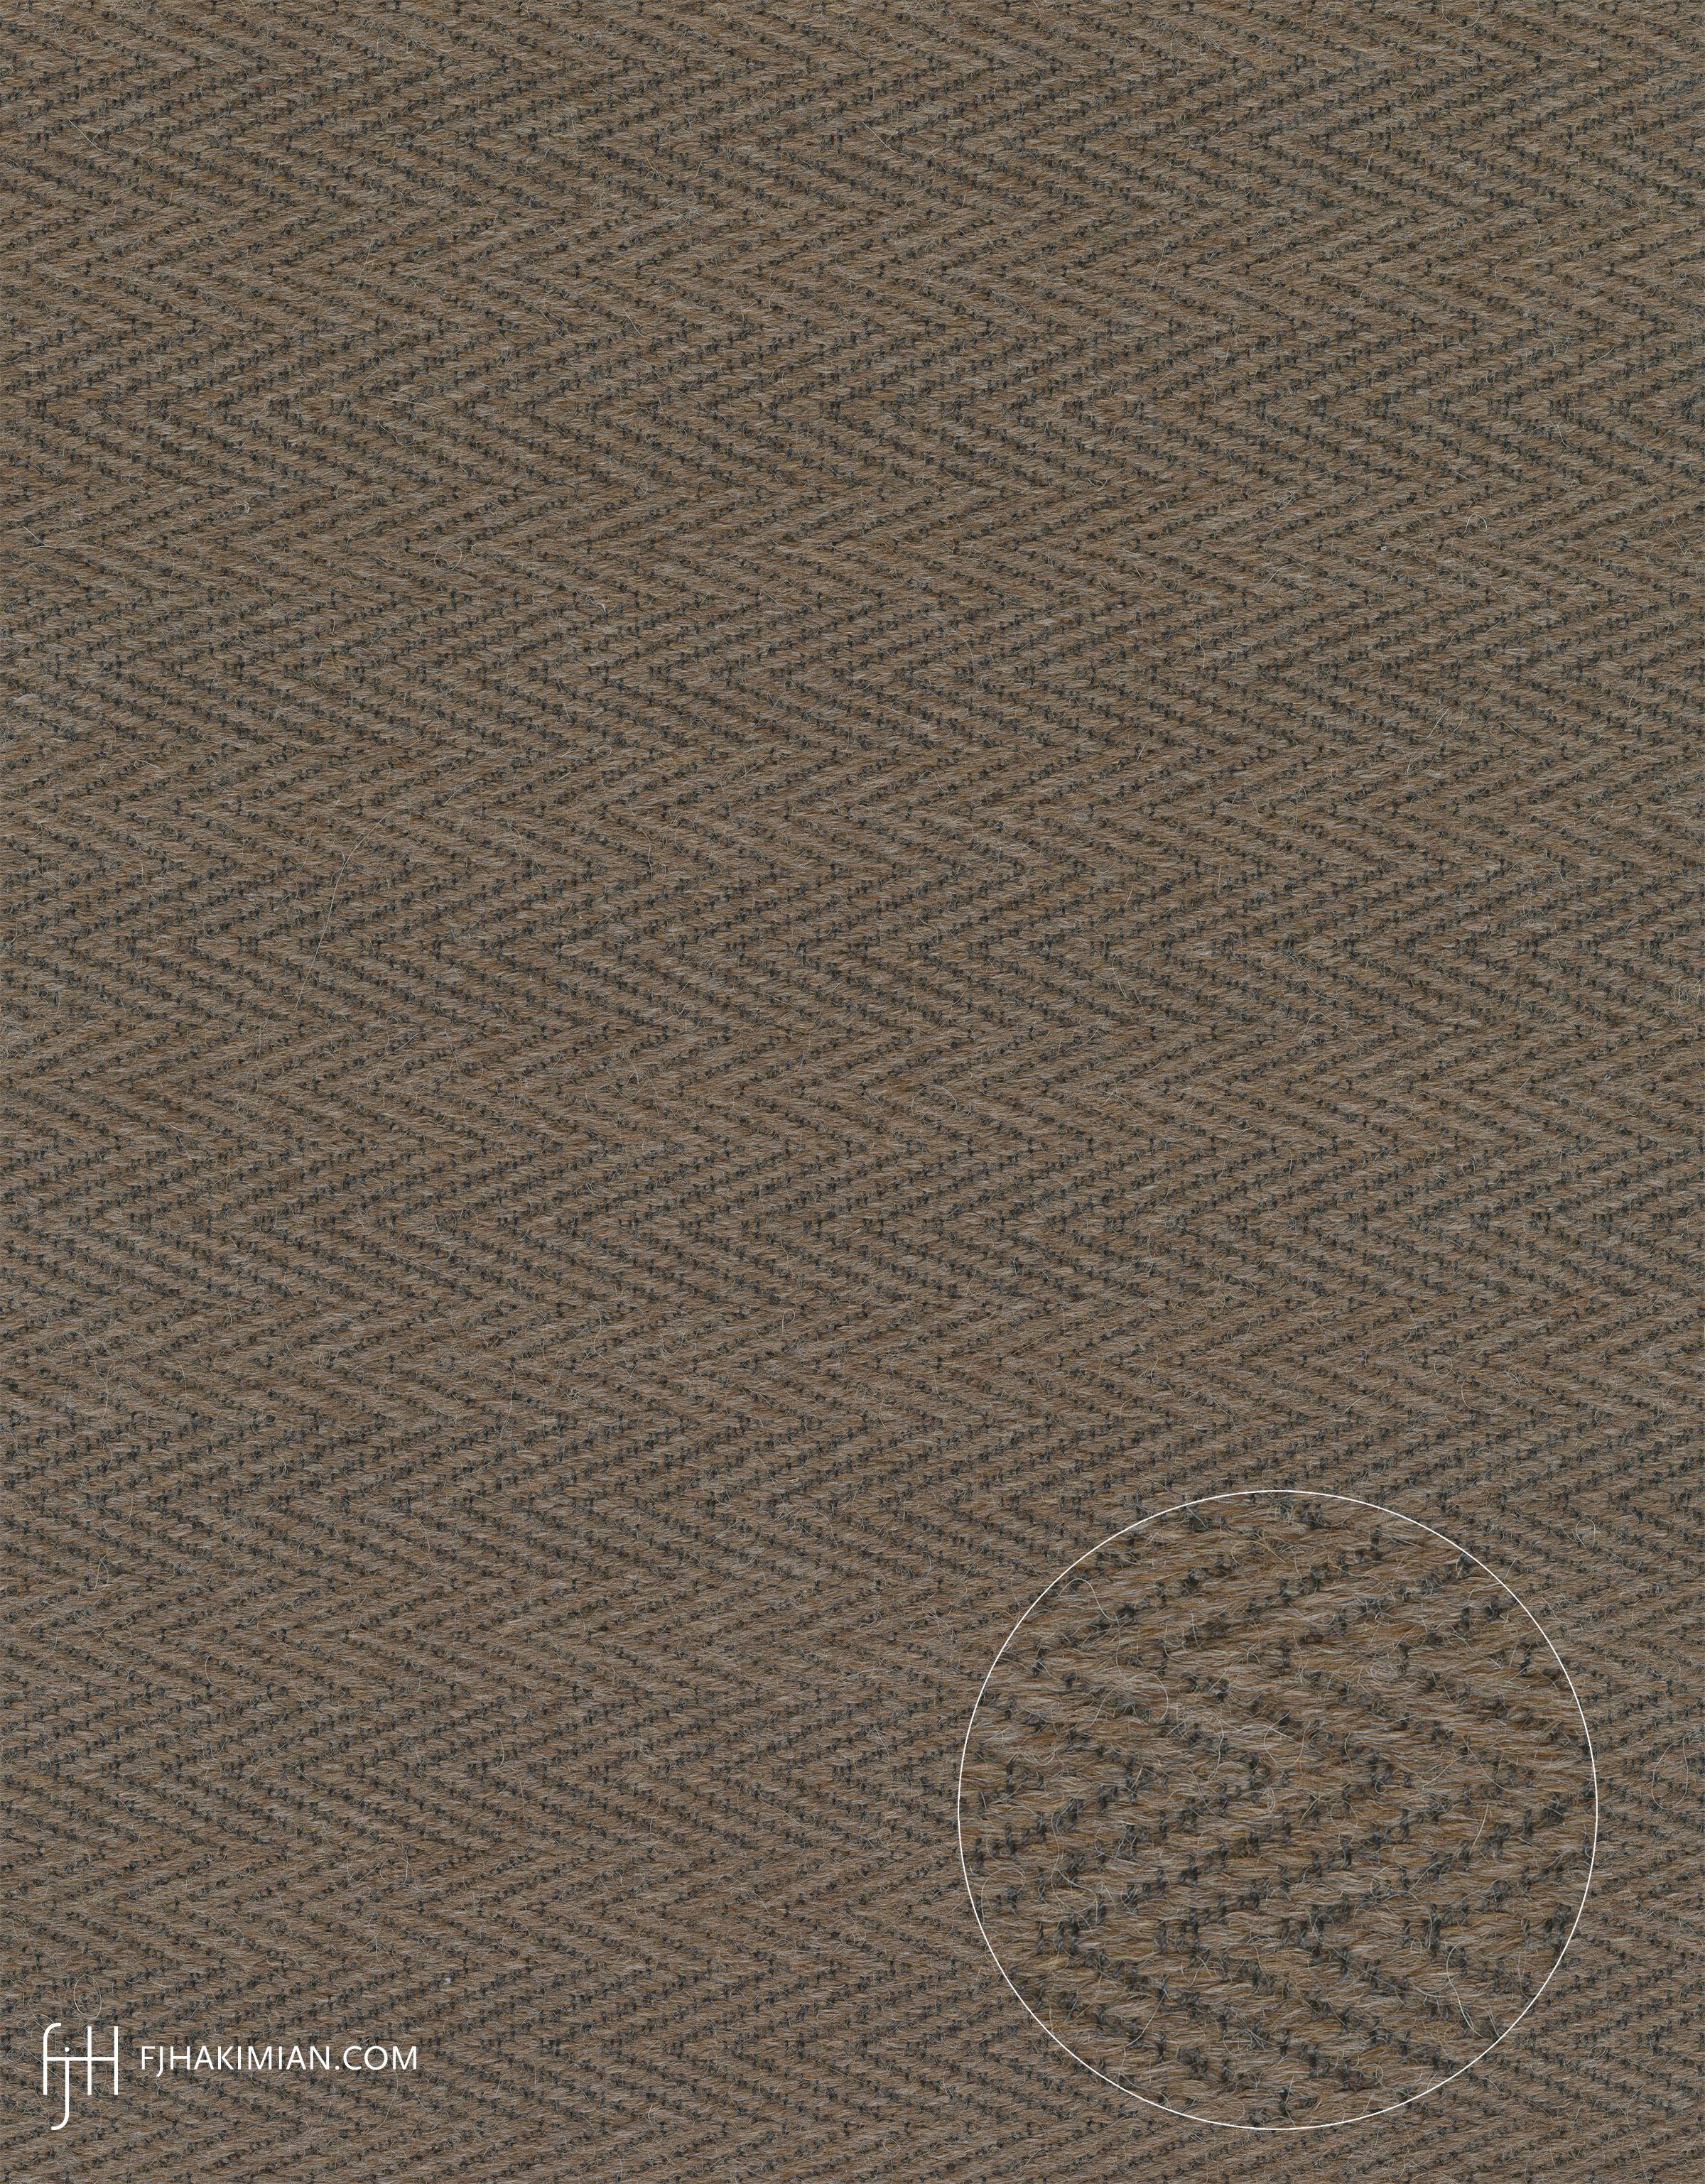 FJ Hakimian | MR-Herringbone B.A. #16 | Custom fabrics